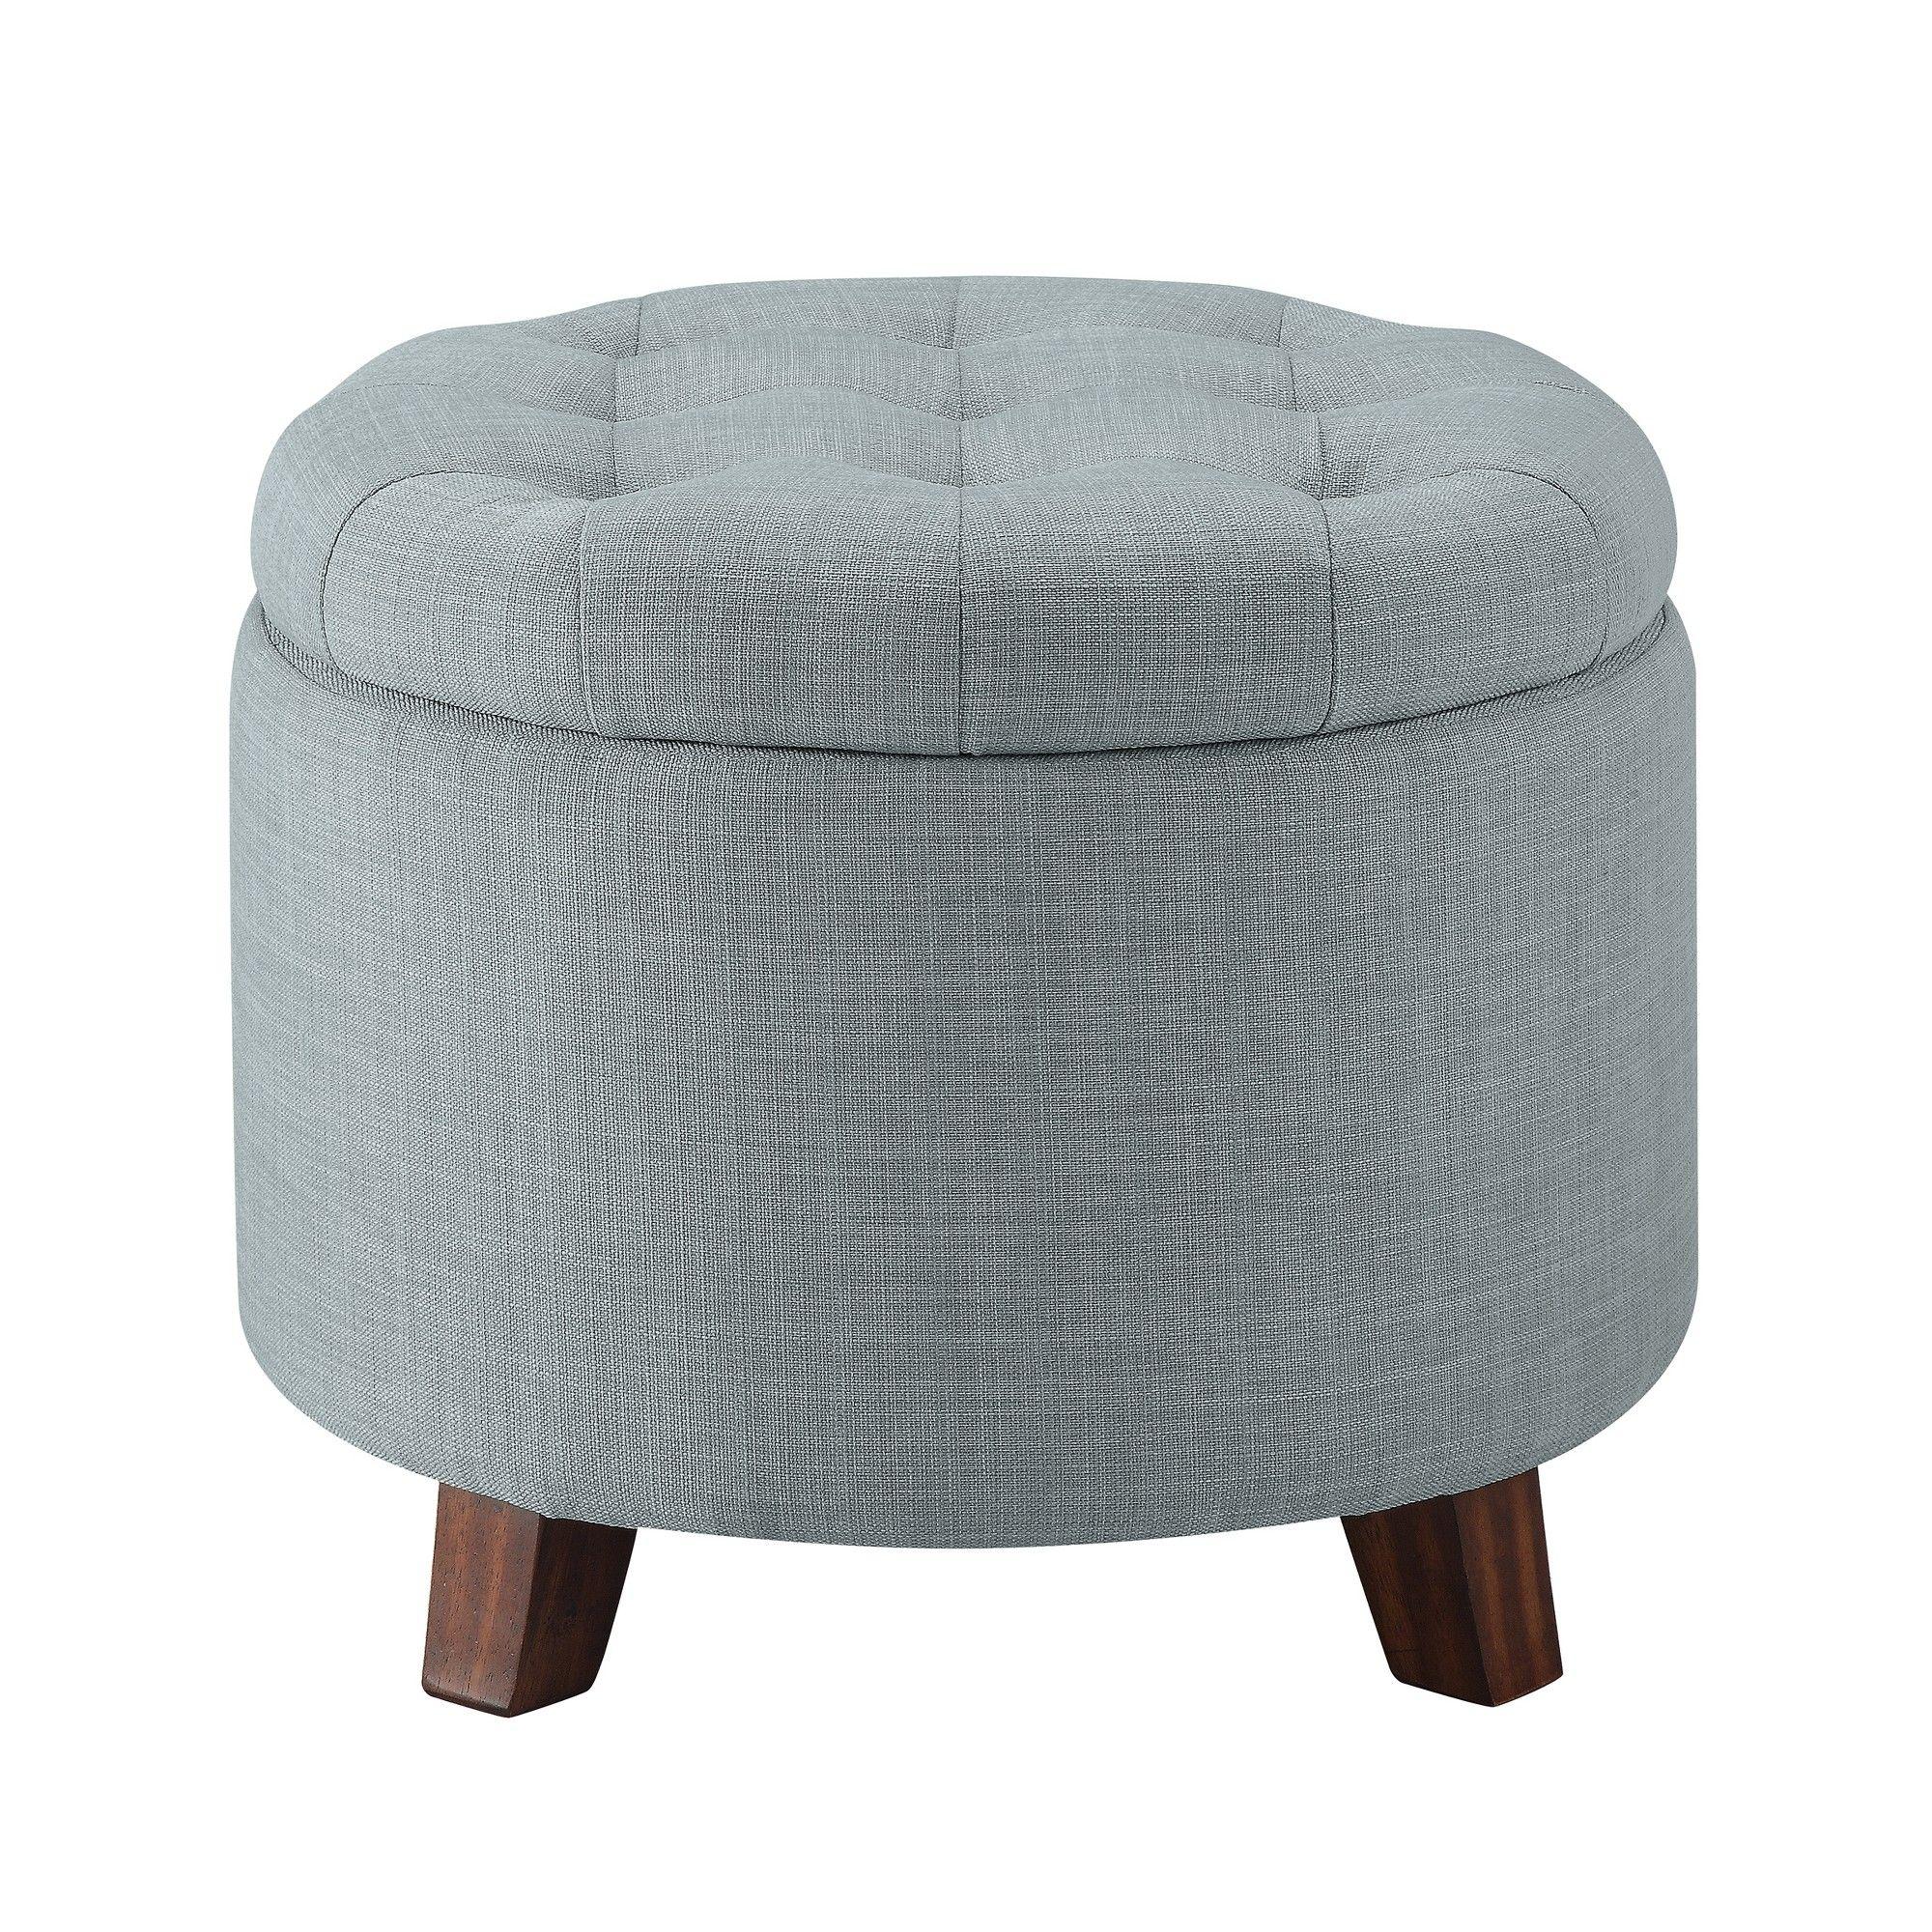 Tufted Round Storage Ottoman Heathered Gray Threshold Adult